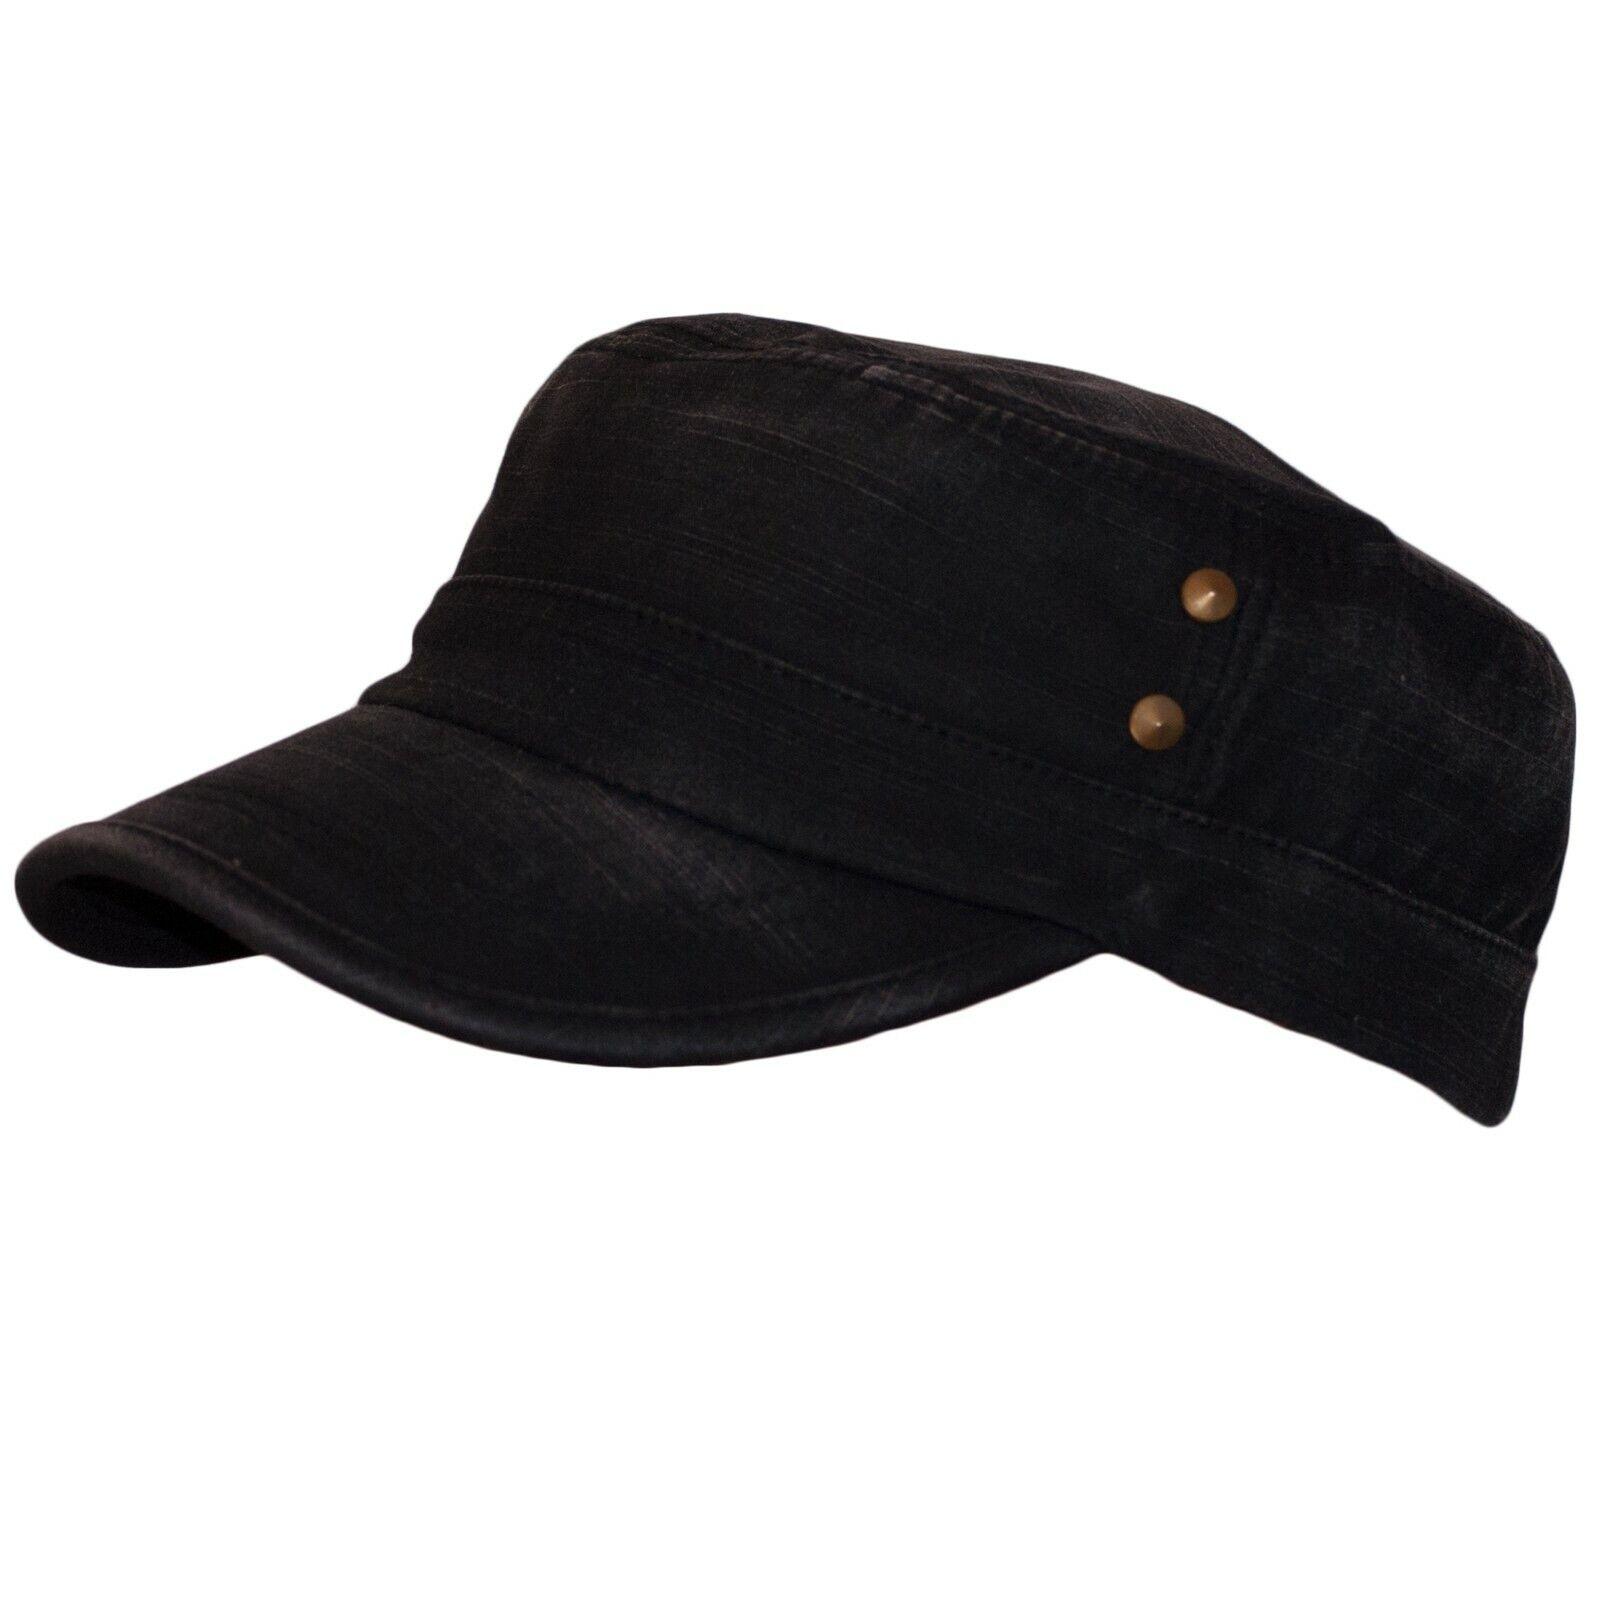 Baseballmutze Military Hat Mens Cadet Slider Hat Bat Hat Shield Cap